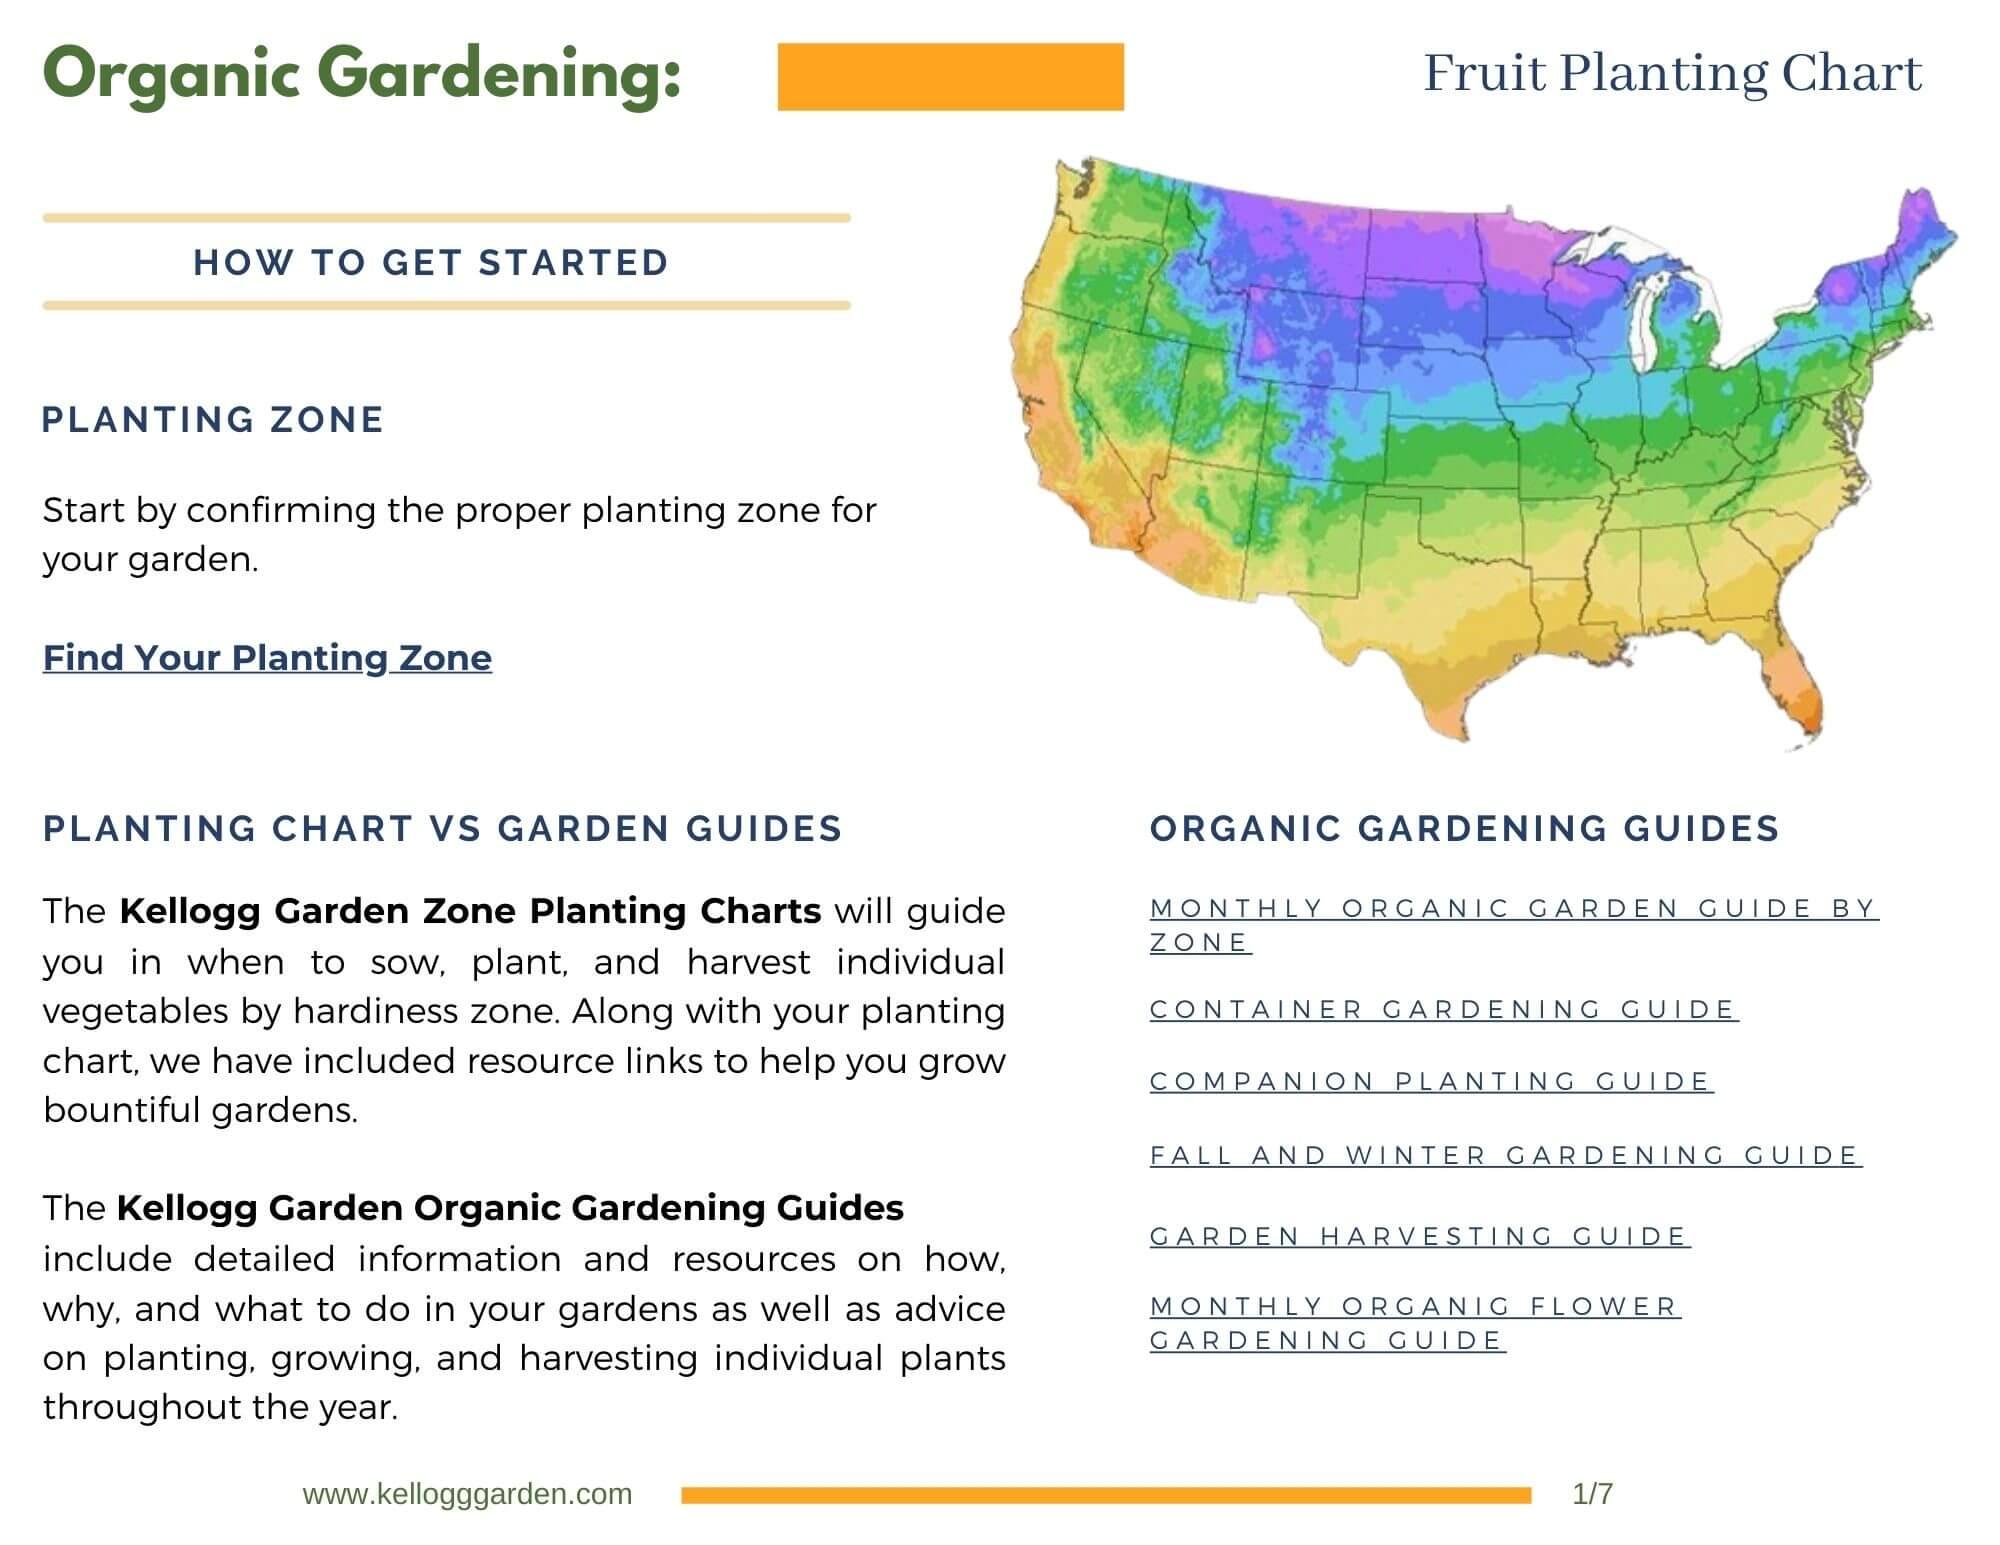 Fruit planting chart